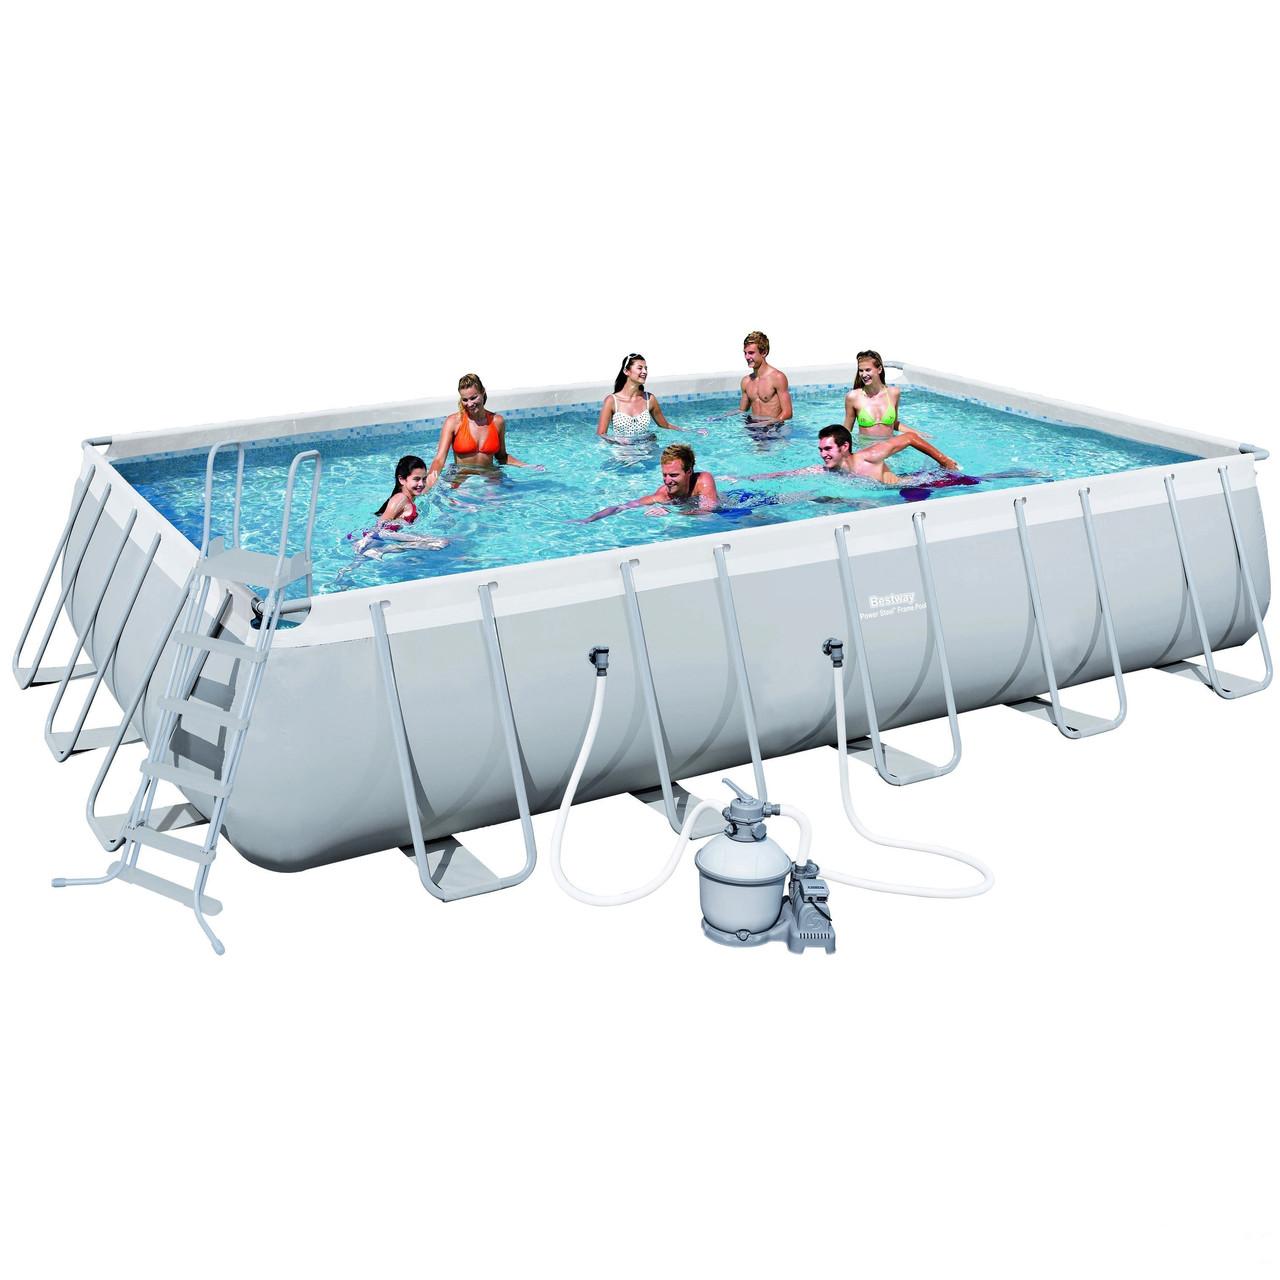 Каркасный бассейн Bestway Power Steel Rectangular Frame 671х366х132 см Басейн прямоугольный